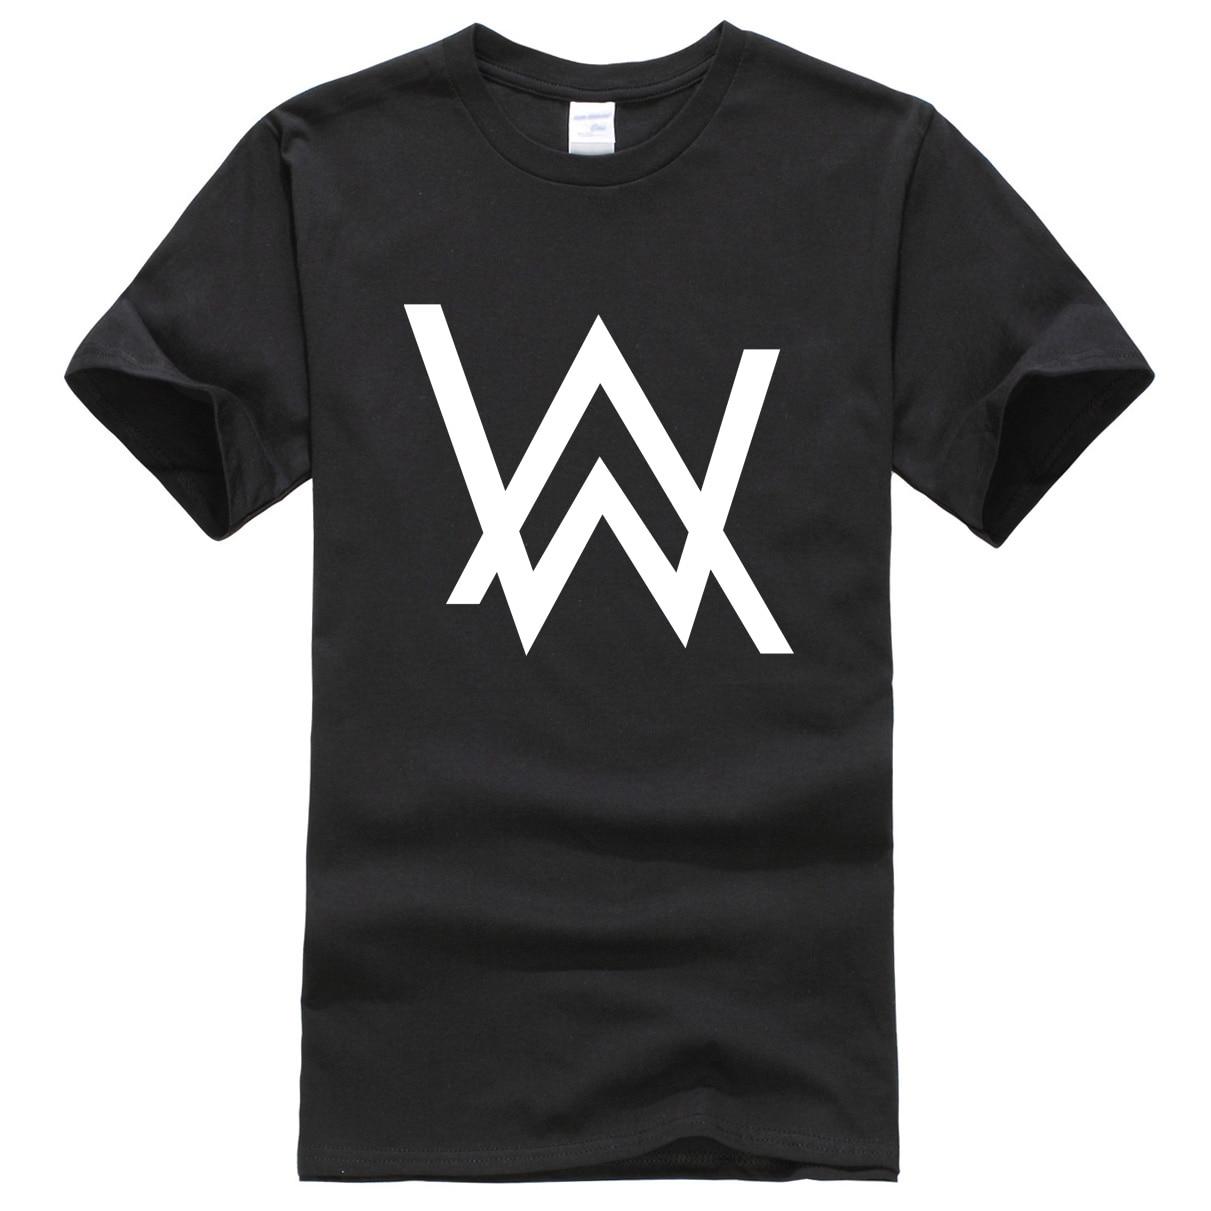 2017 men 39 s t shirts cotton crossfit crossfit tee shirt for Men s t shirt top brands